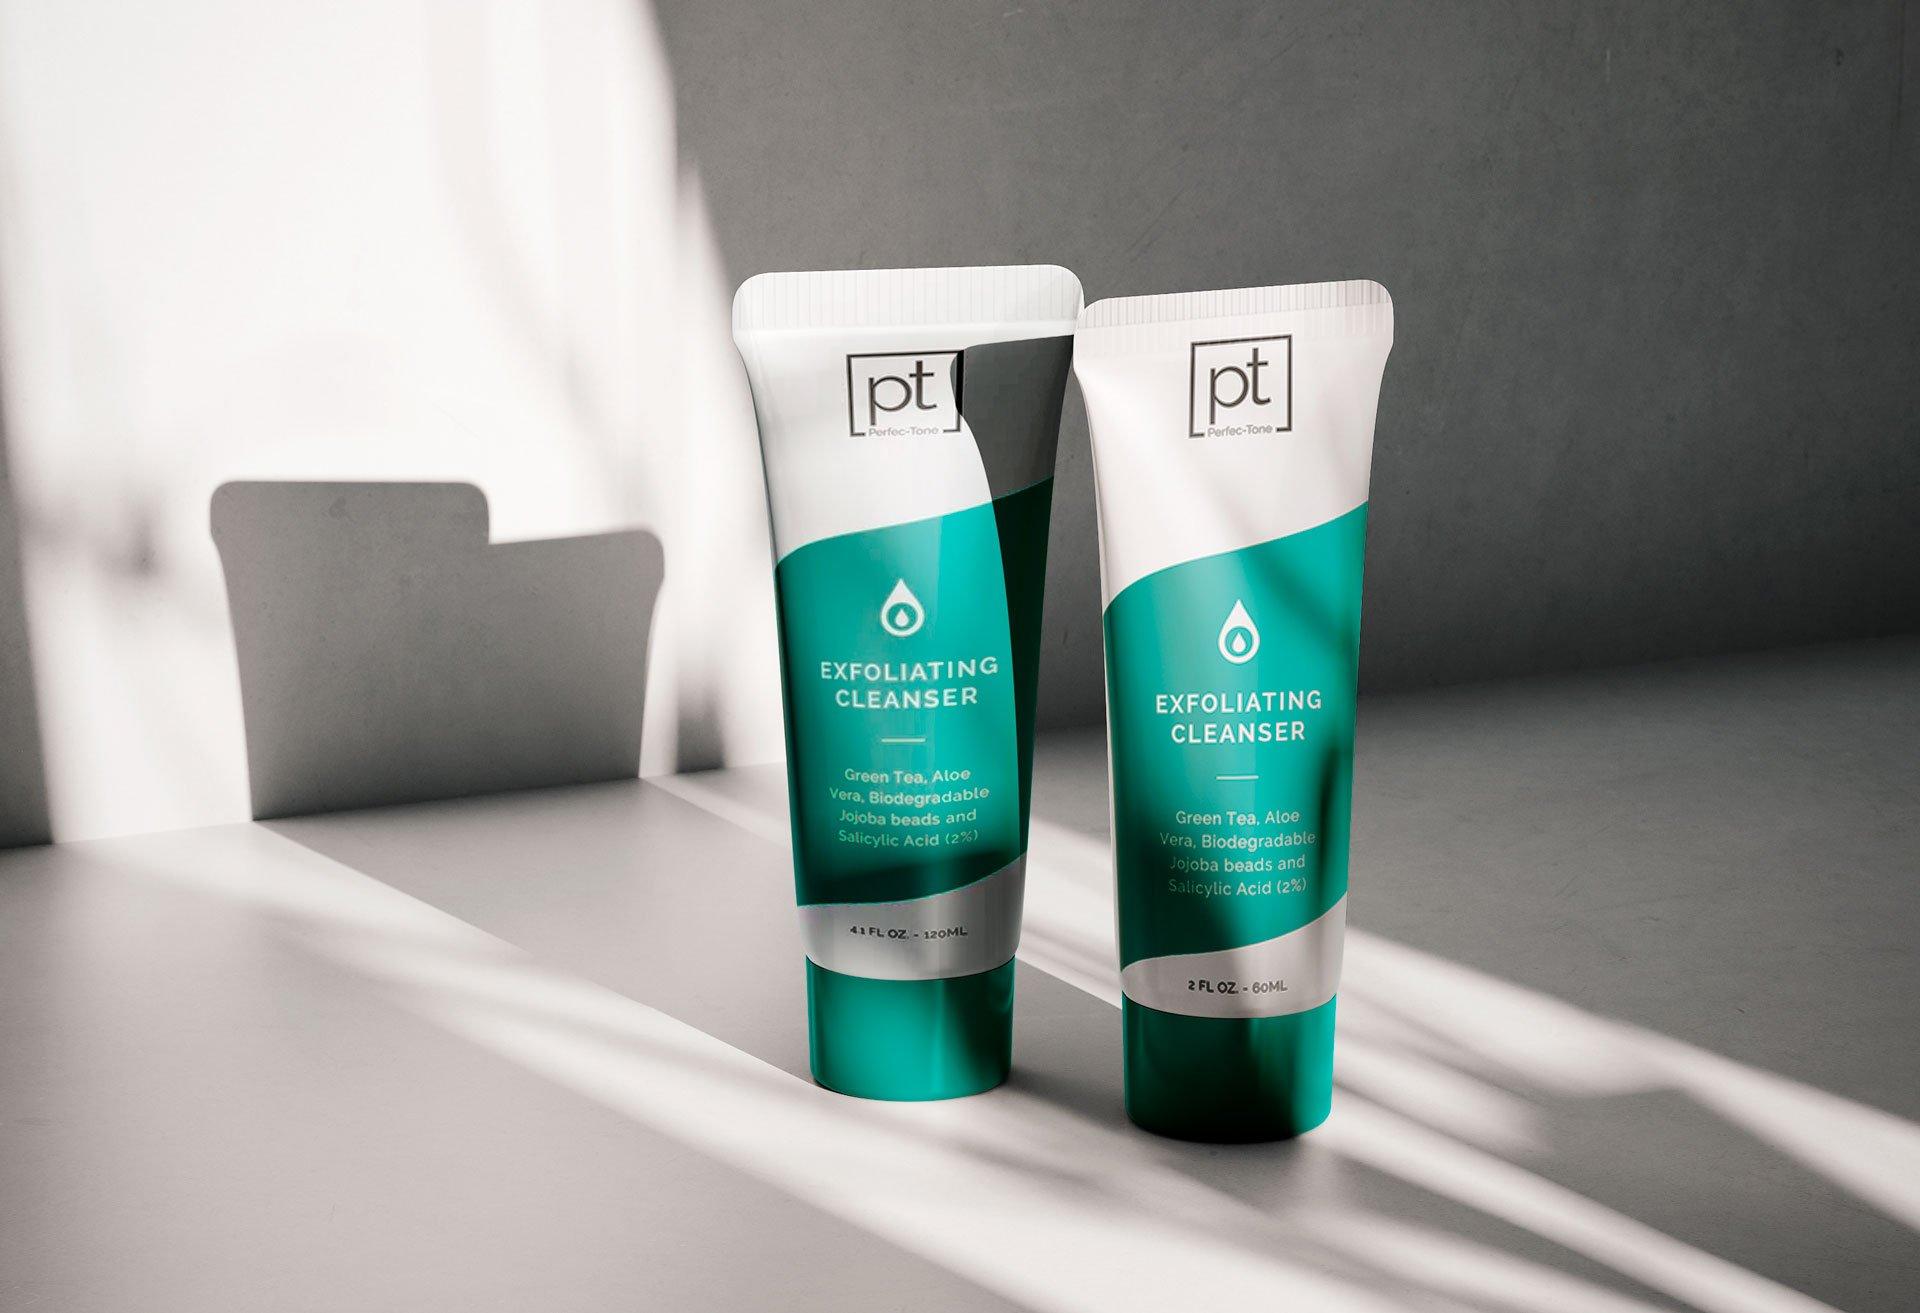 Beauty-Marketing-Photo-Product